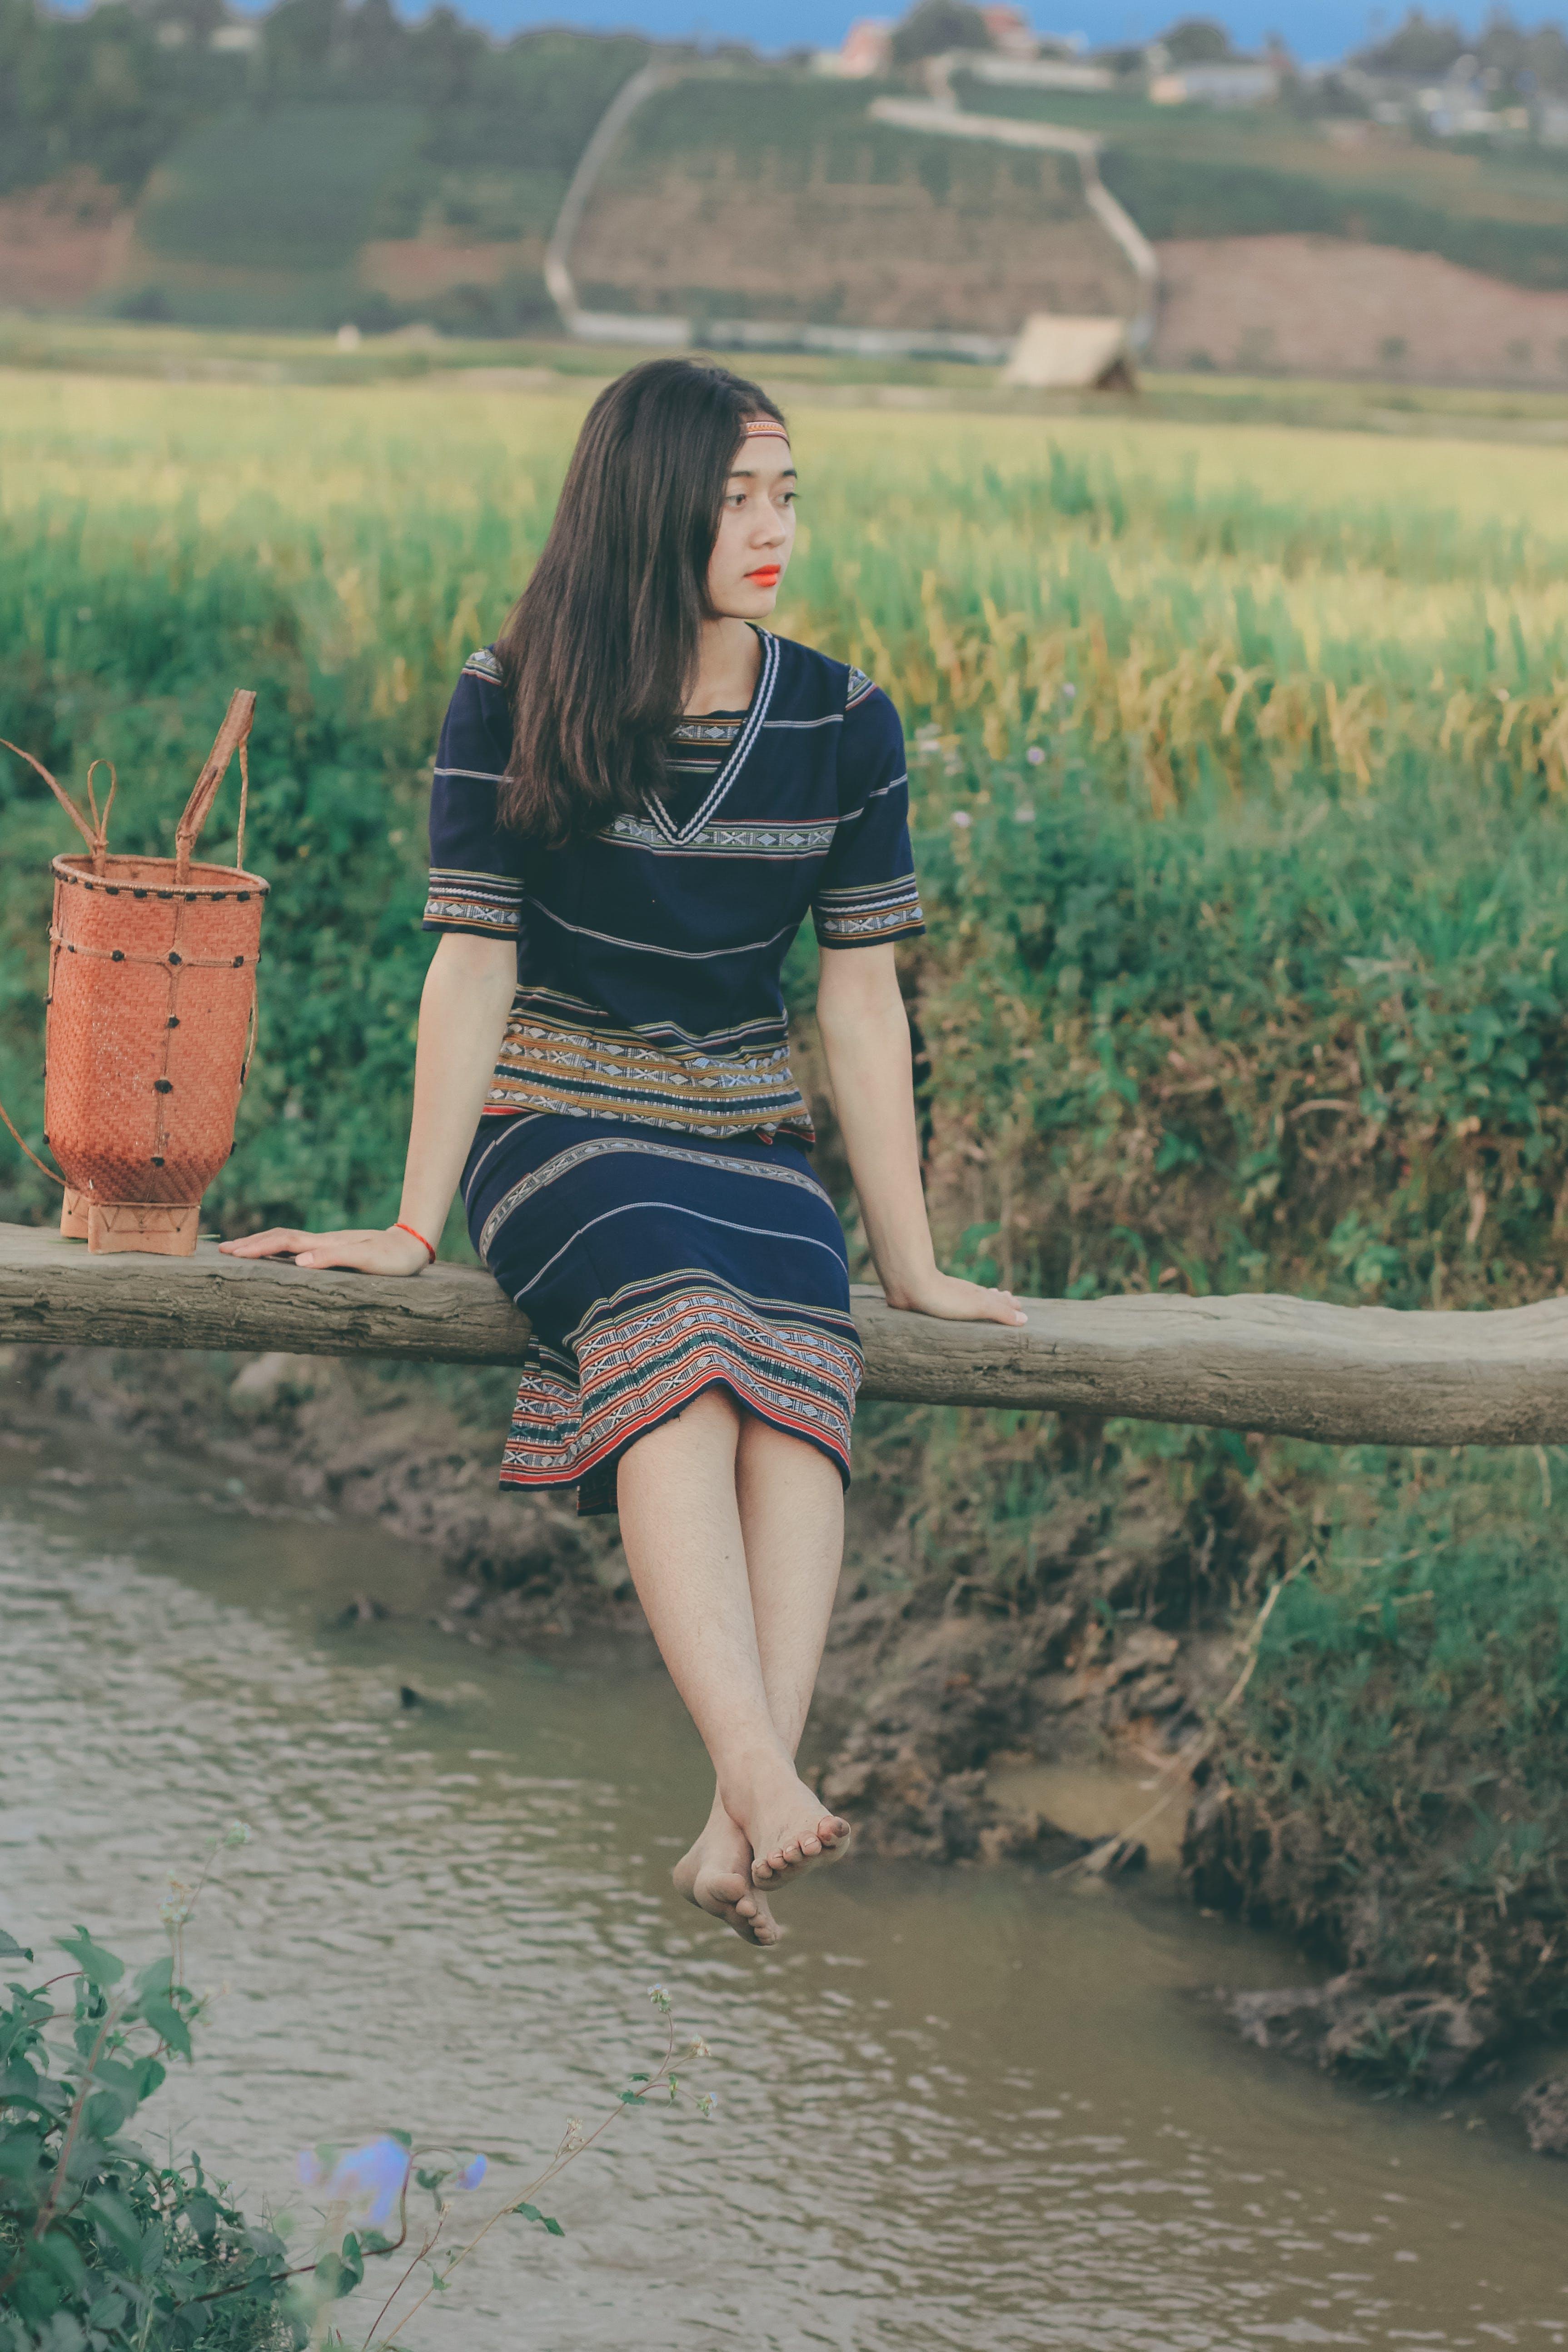 Woman Sitting on Bridge over Flowing Water